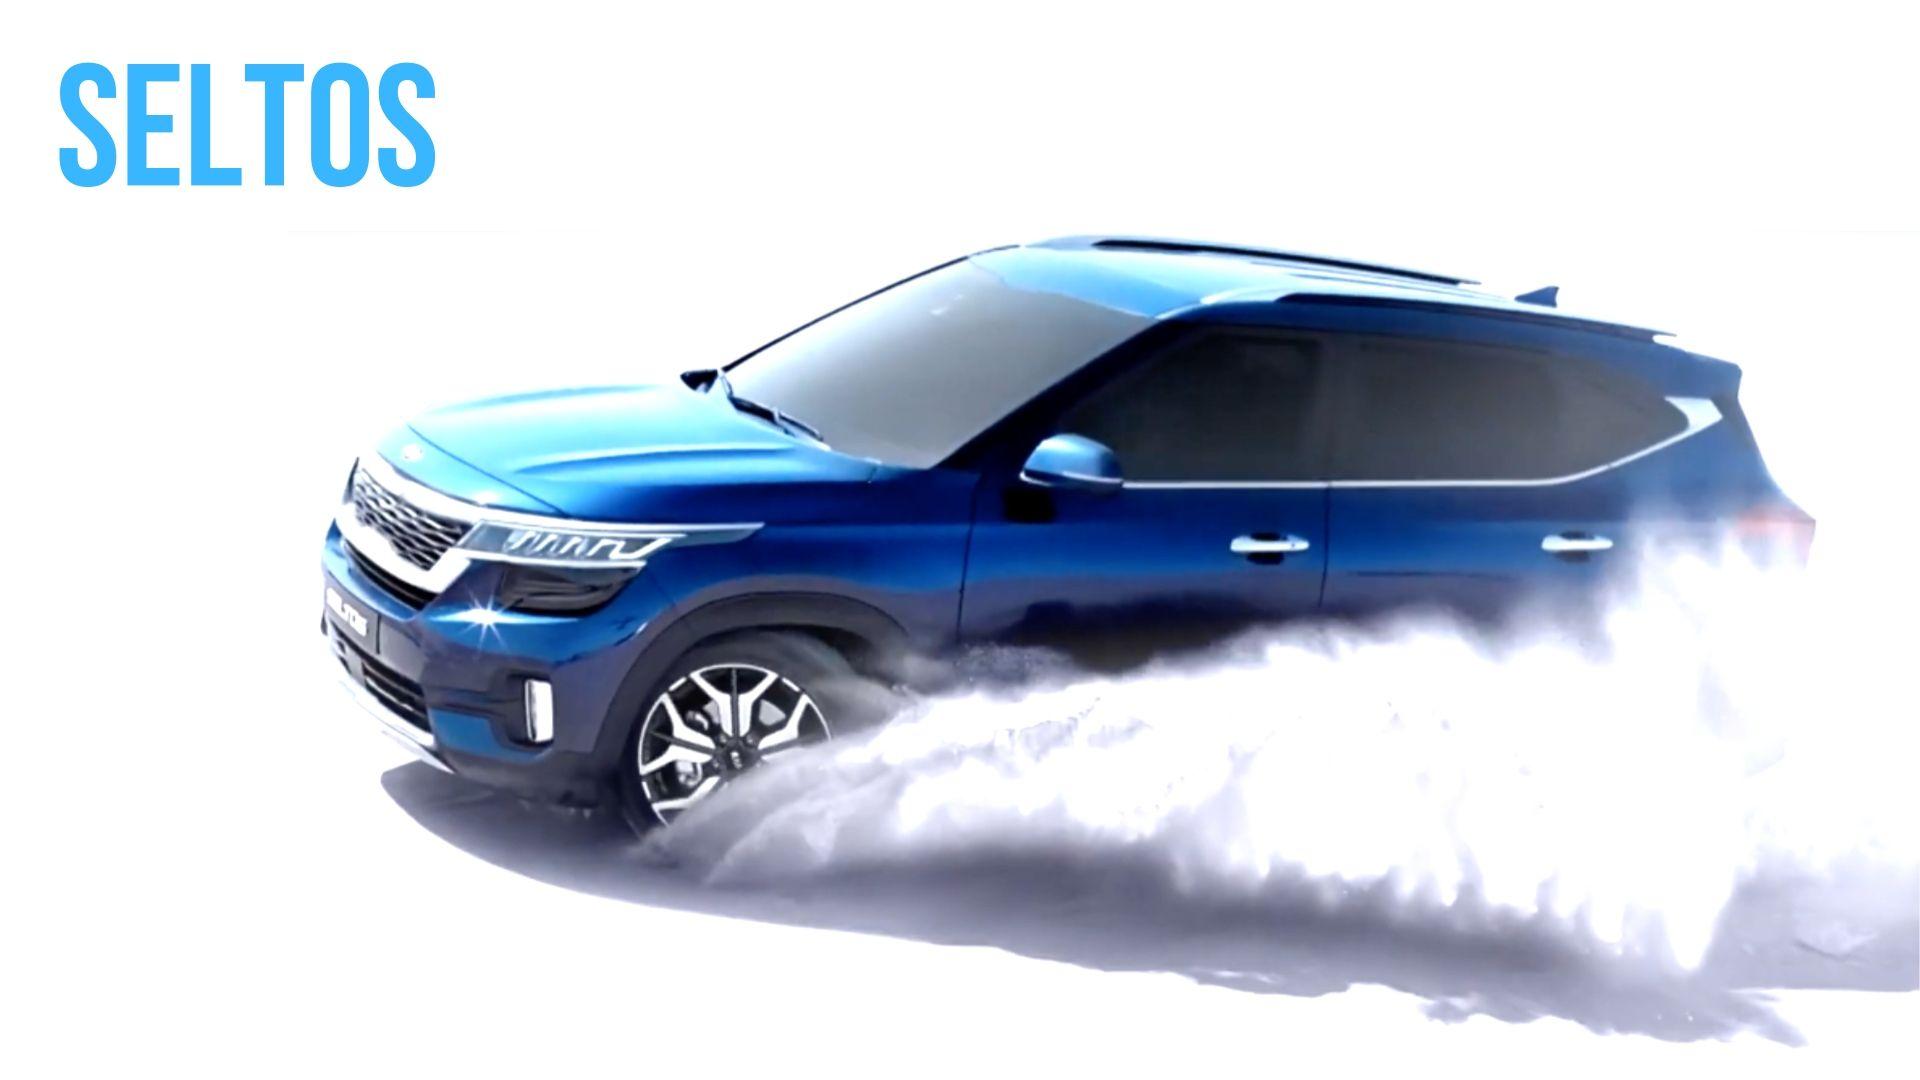 Ford Lightning Specs >> Kia Seltos TVC Revealed, Puts Design on Focus - Watch Video